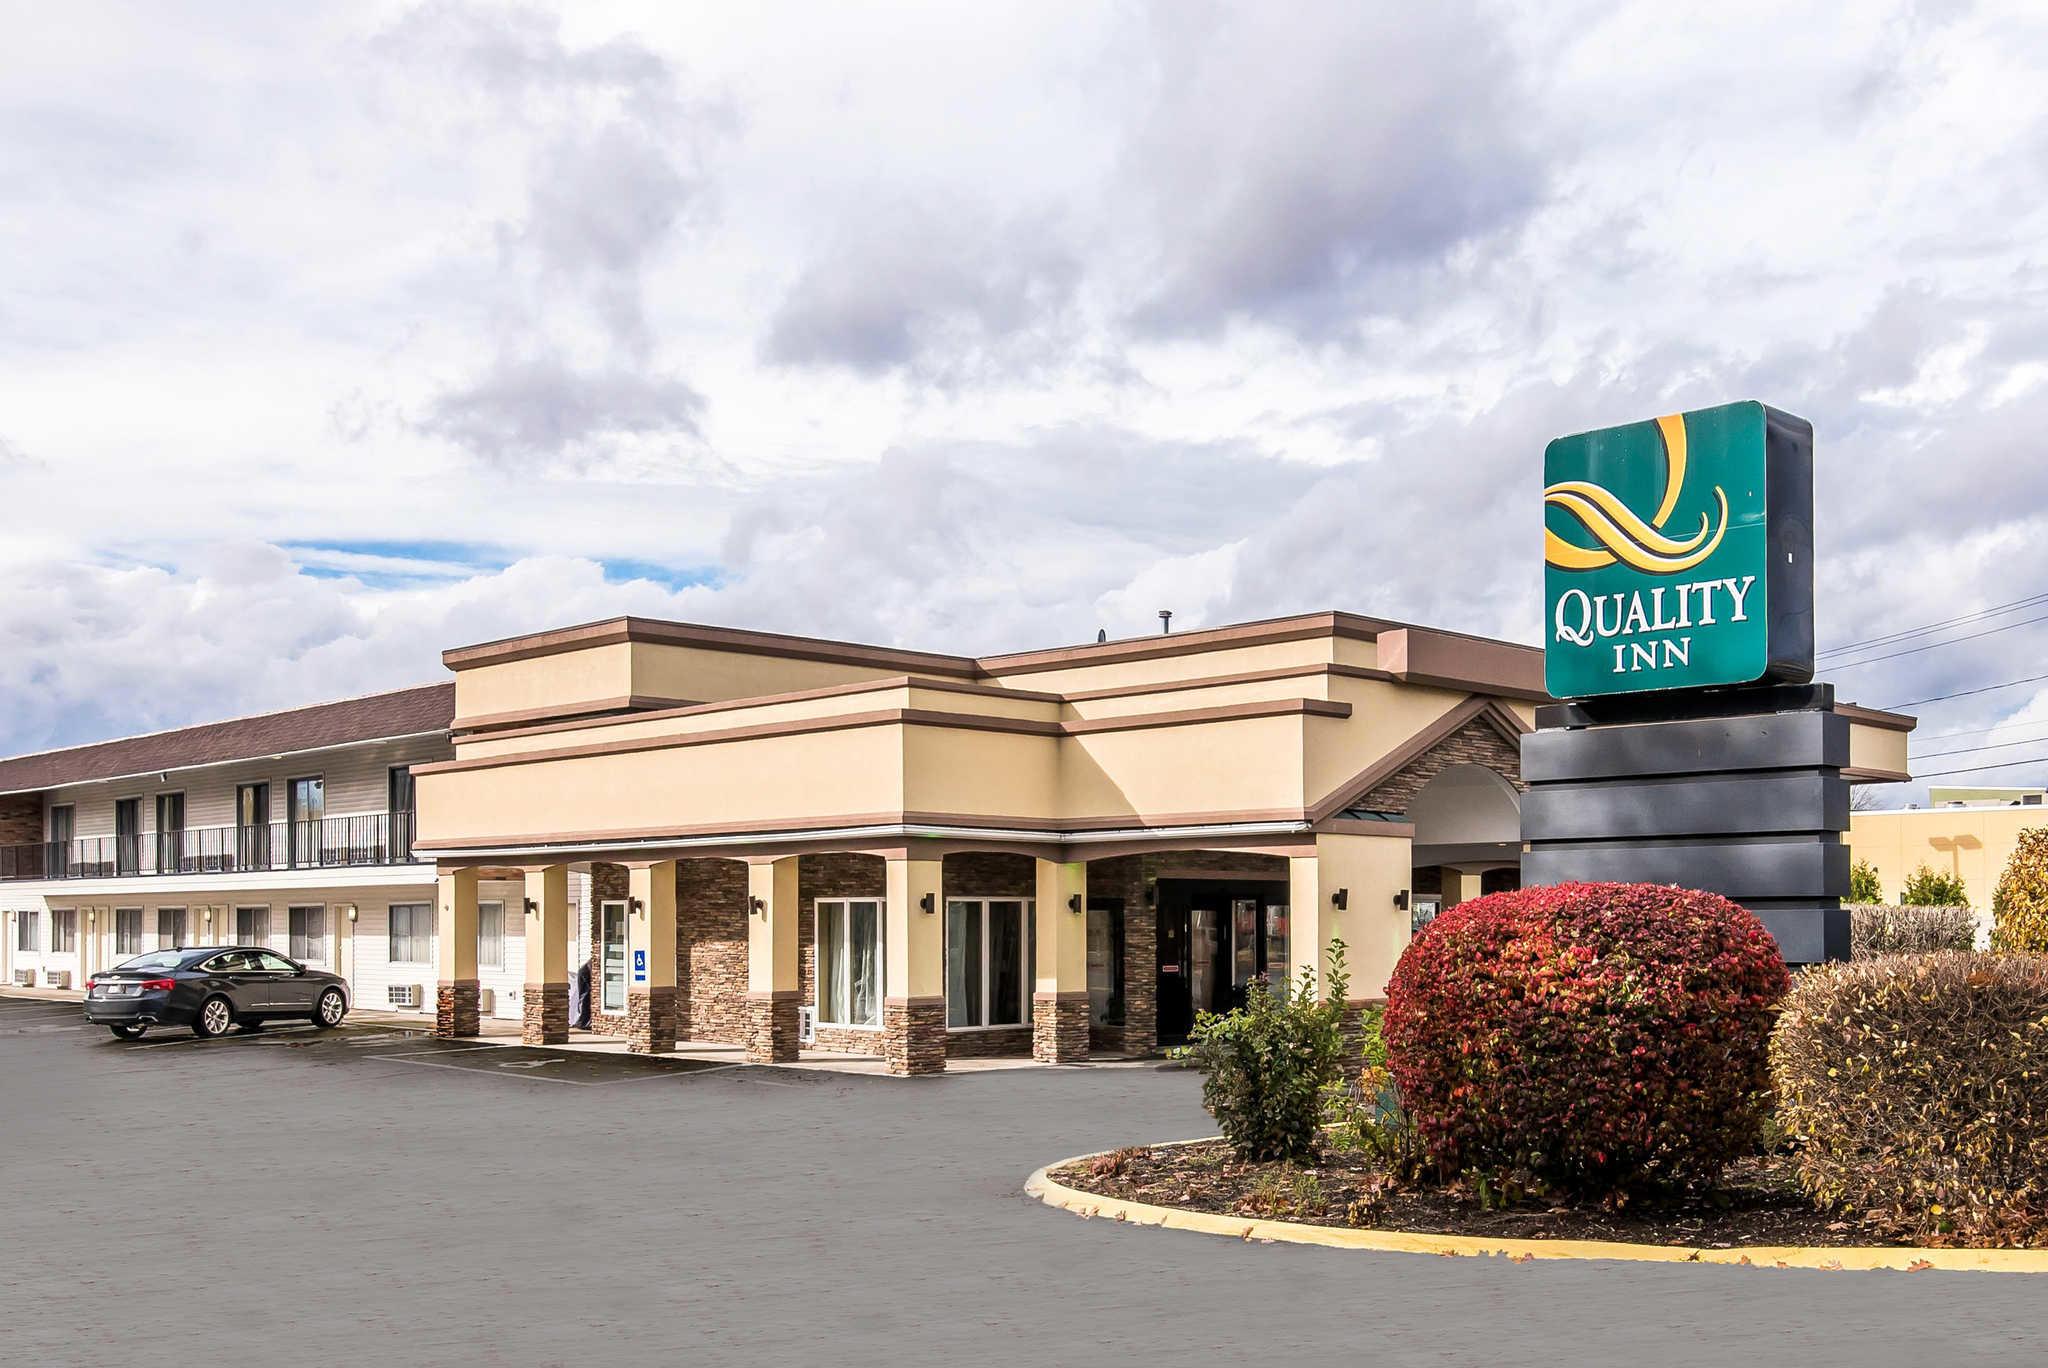 Quality Inn  Rutland Vermont  Vt